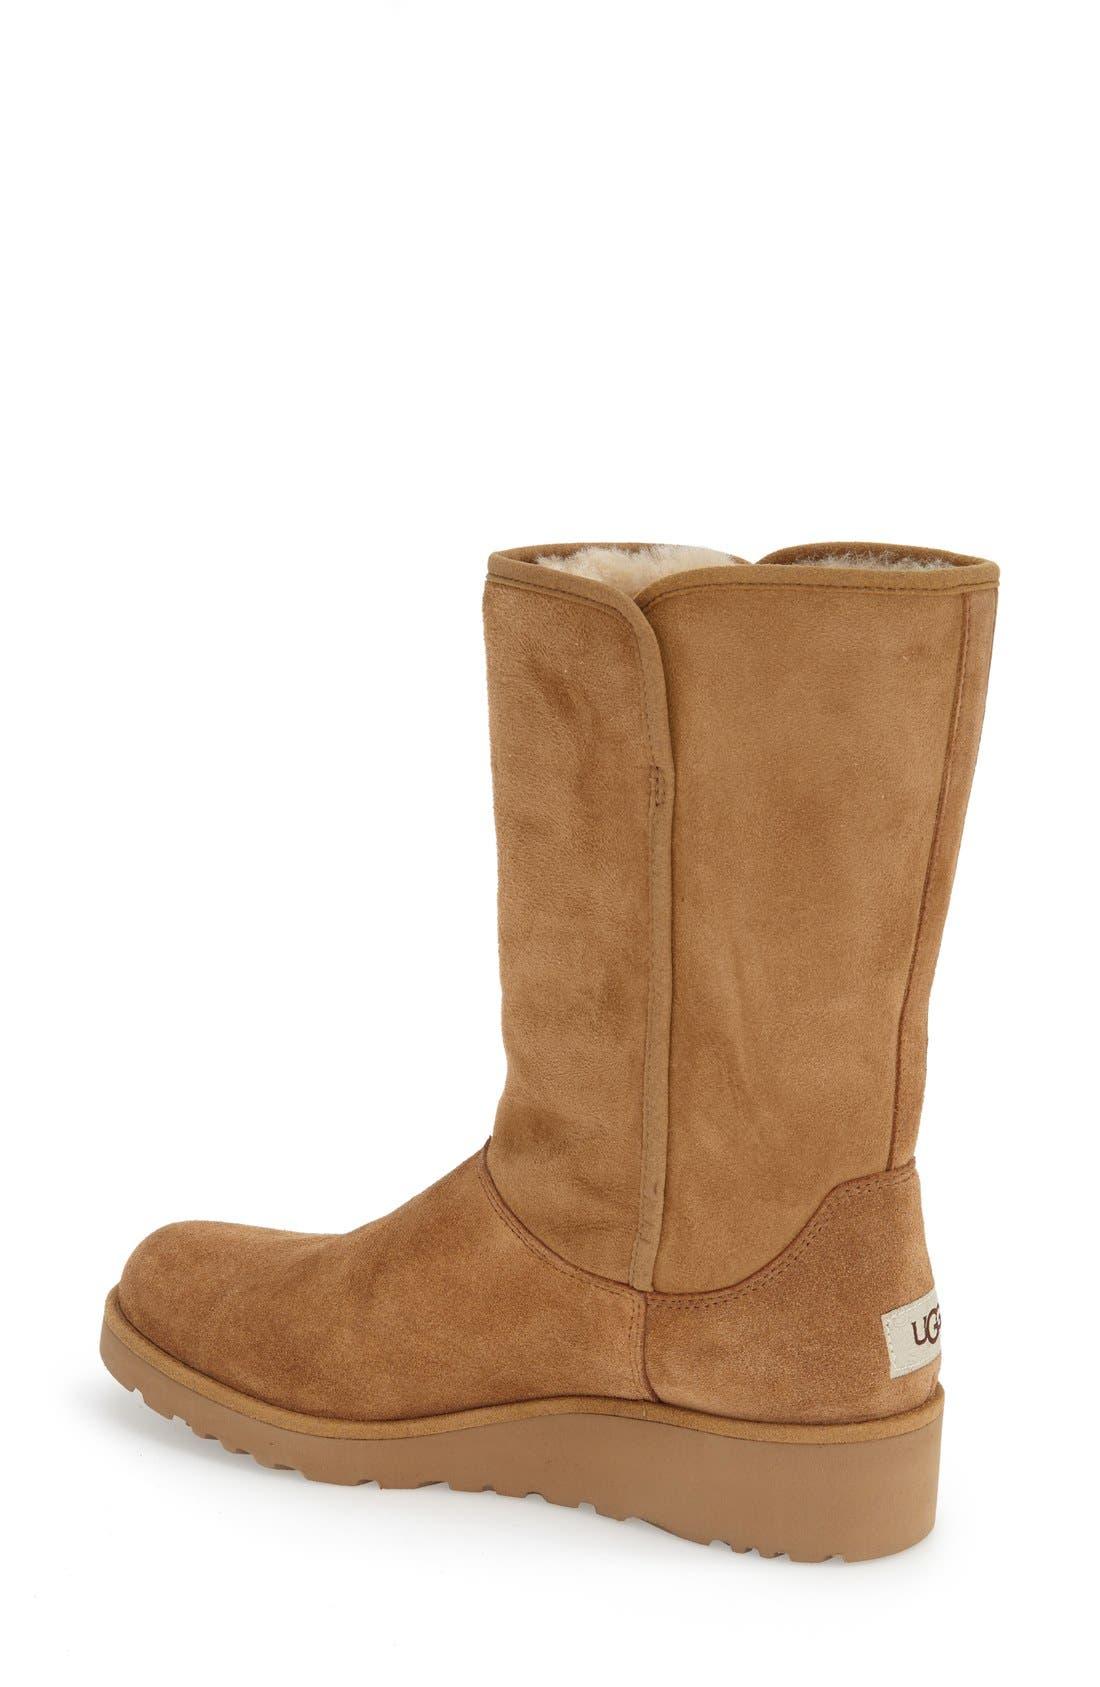 Sale Womens Boots Booties Nordstrom Cut Engineer Crocodile Safety Steel Genuine Leather Brown